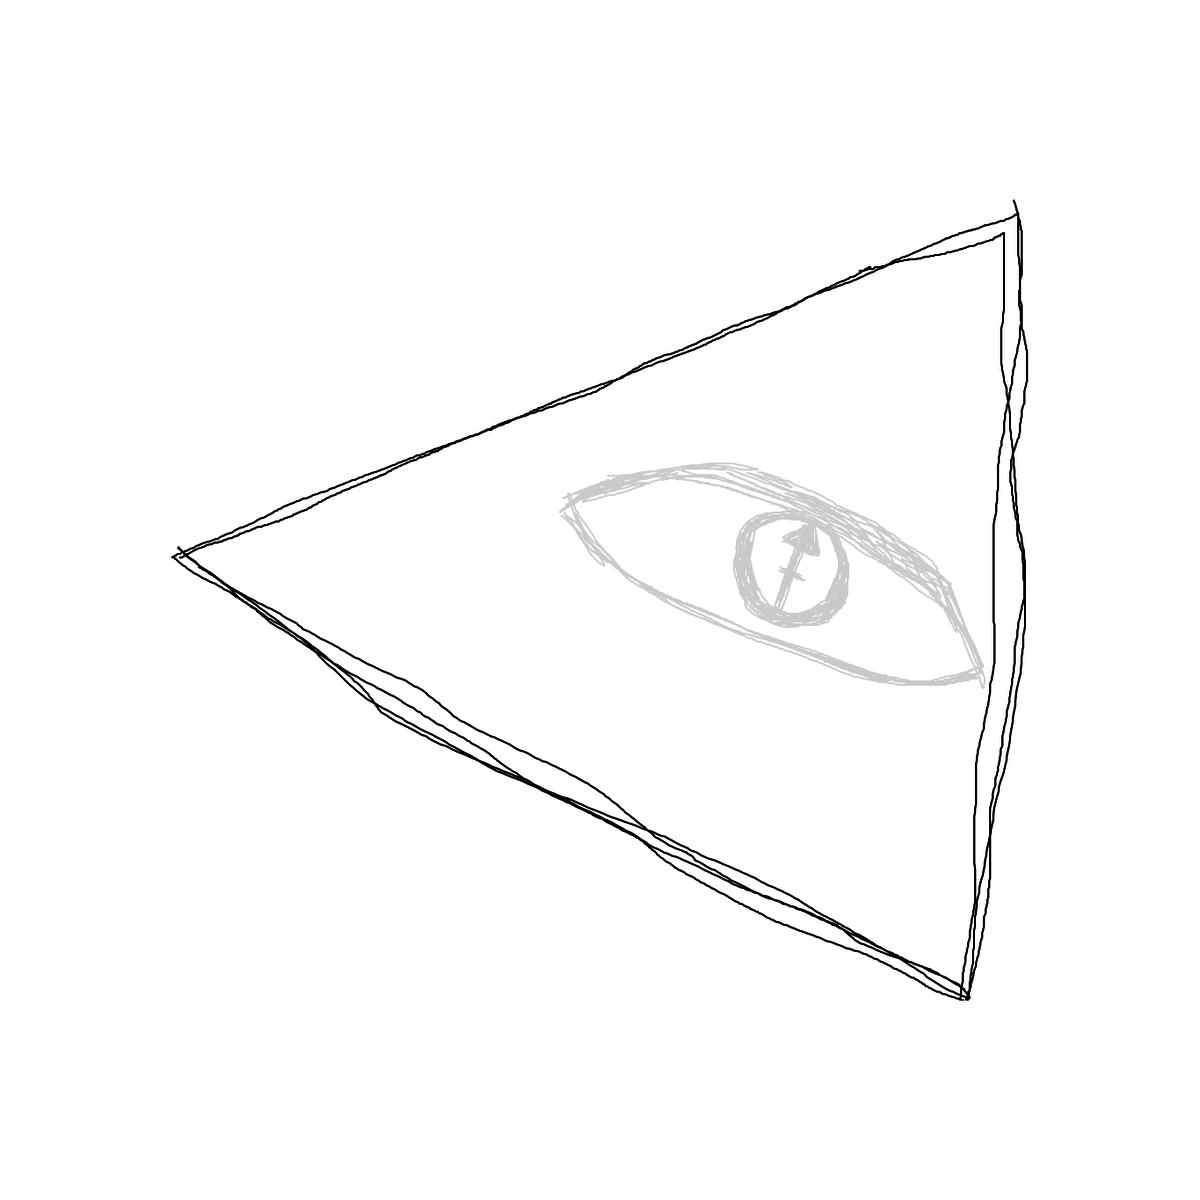 BAAAM drawing#22636 lat:55.7520790100097660lng: 37.6204719543457000